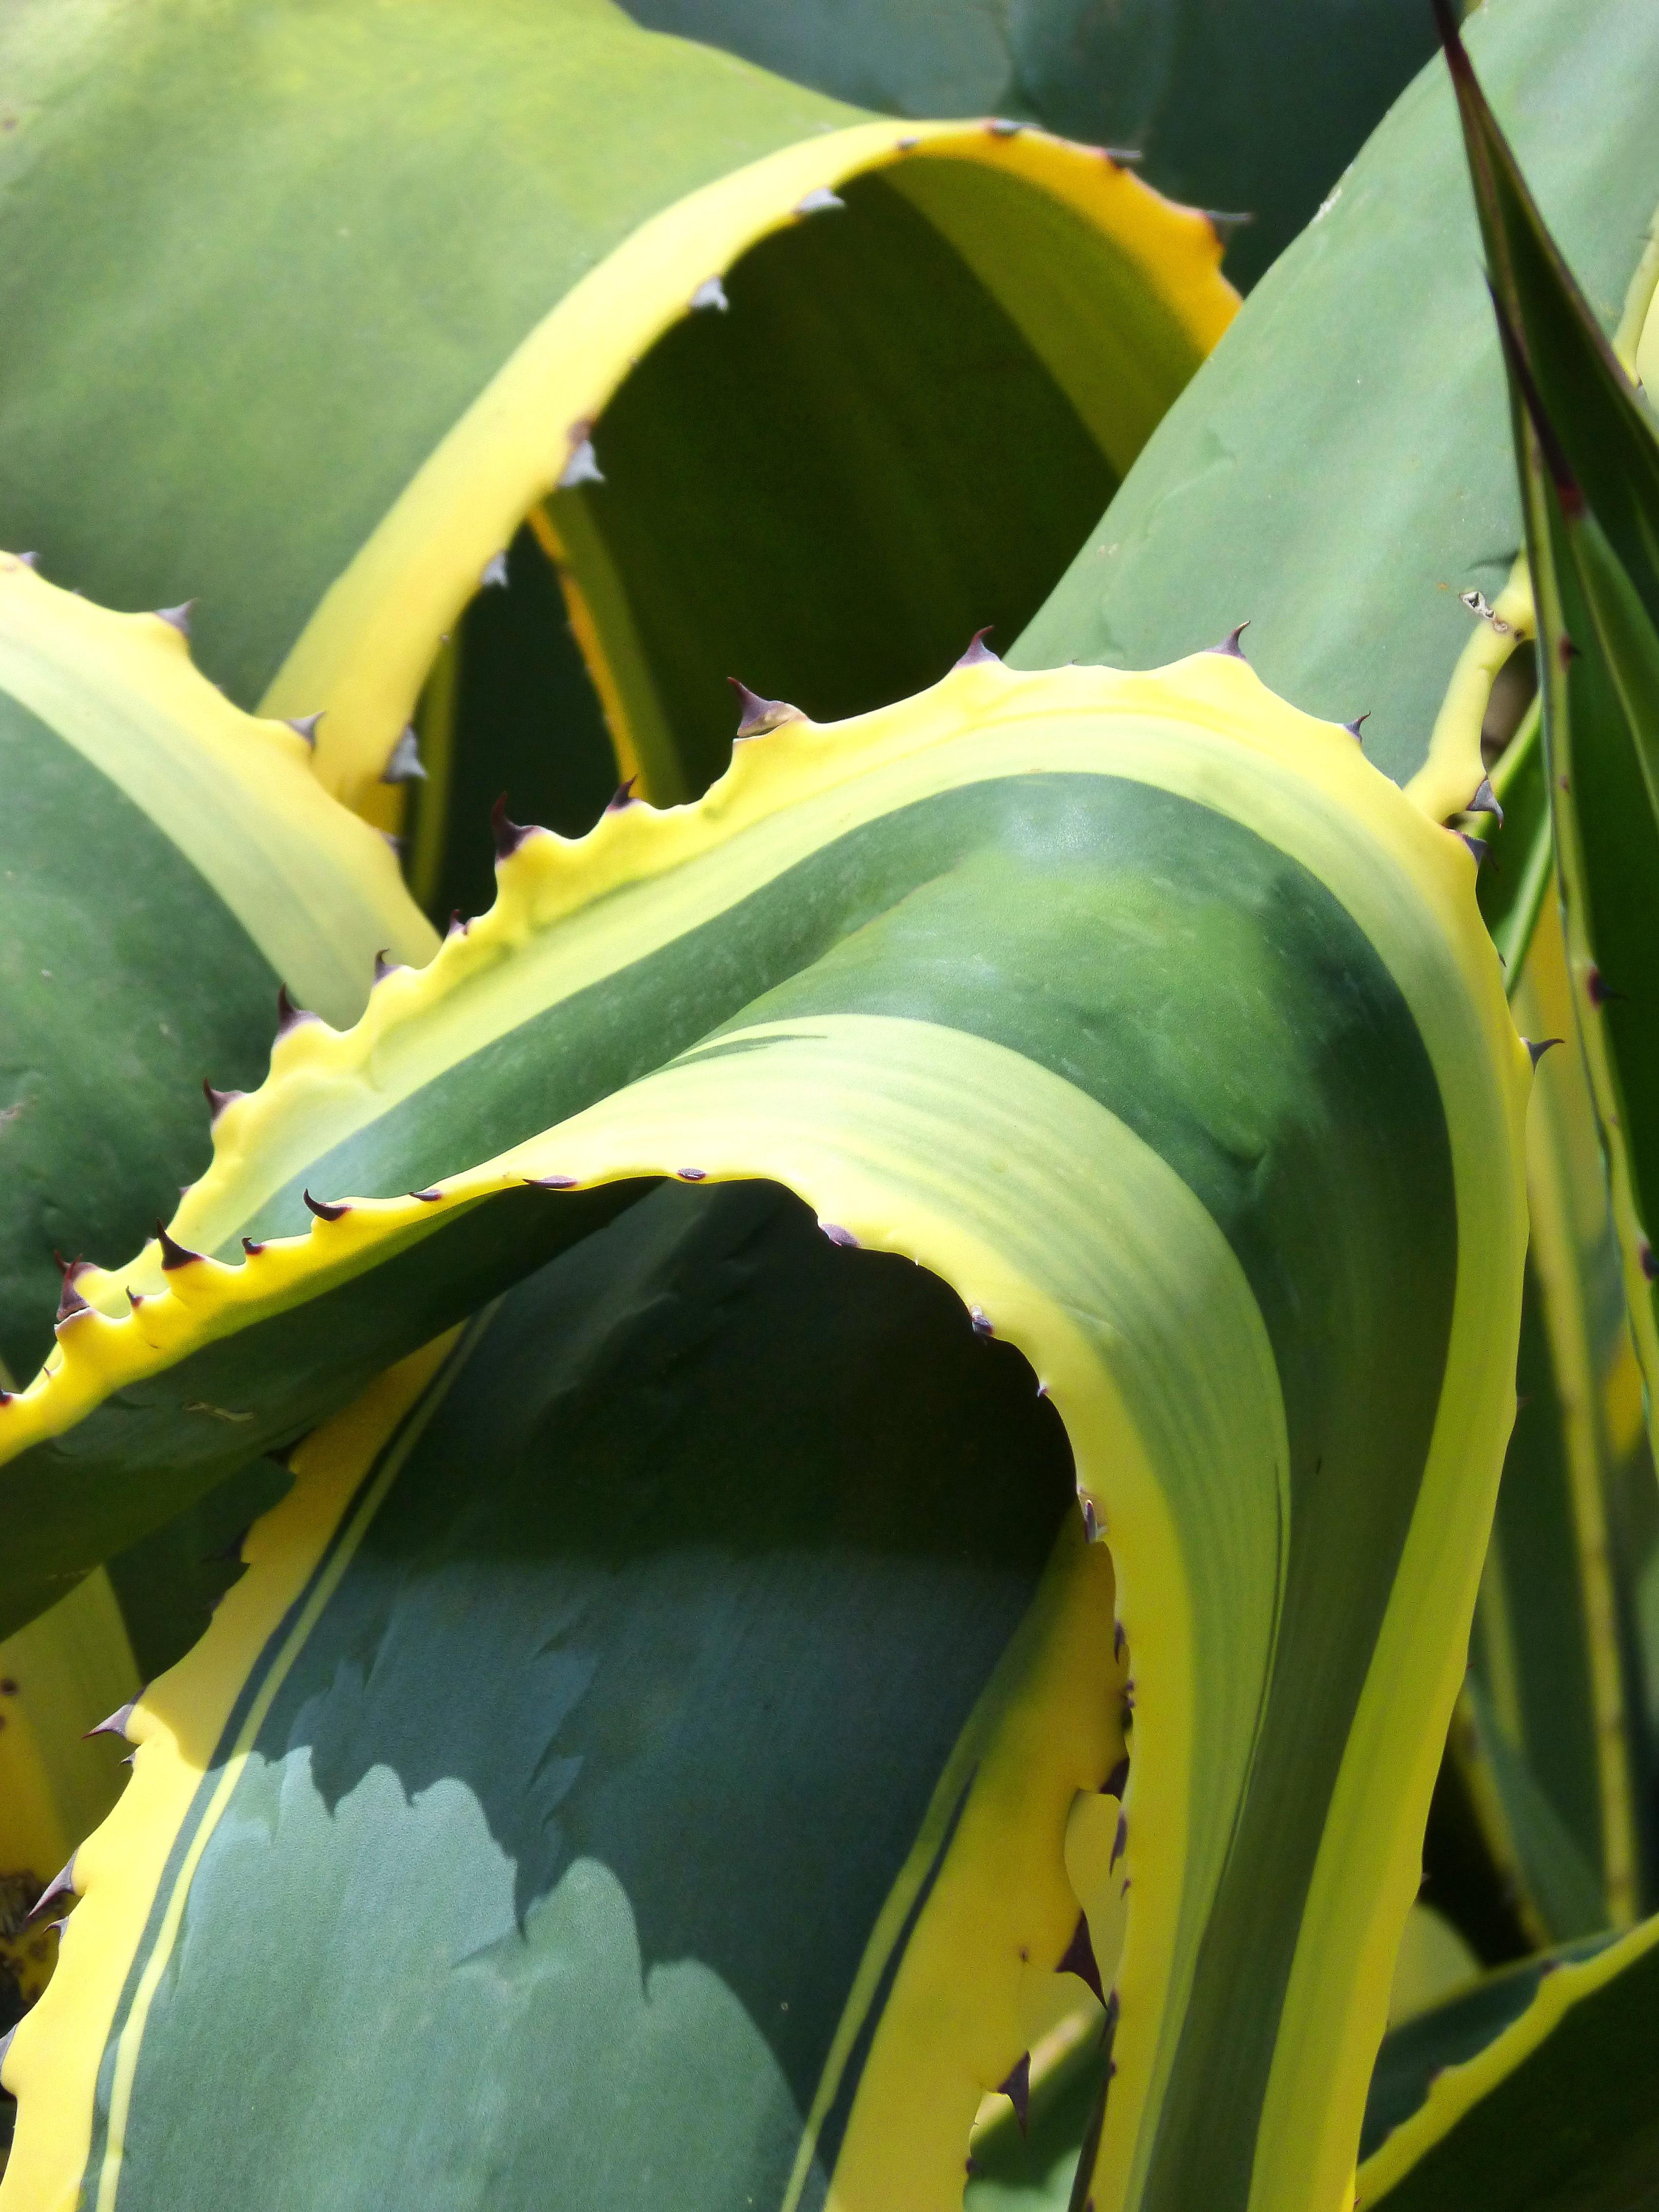 Image Plante Aloe Vera gambar : kaktus, menanam, tekstur, daun, bunga, hijau